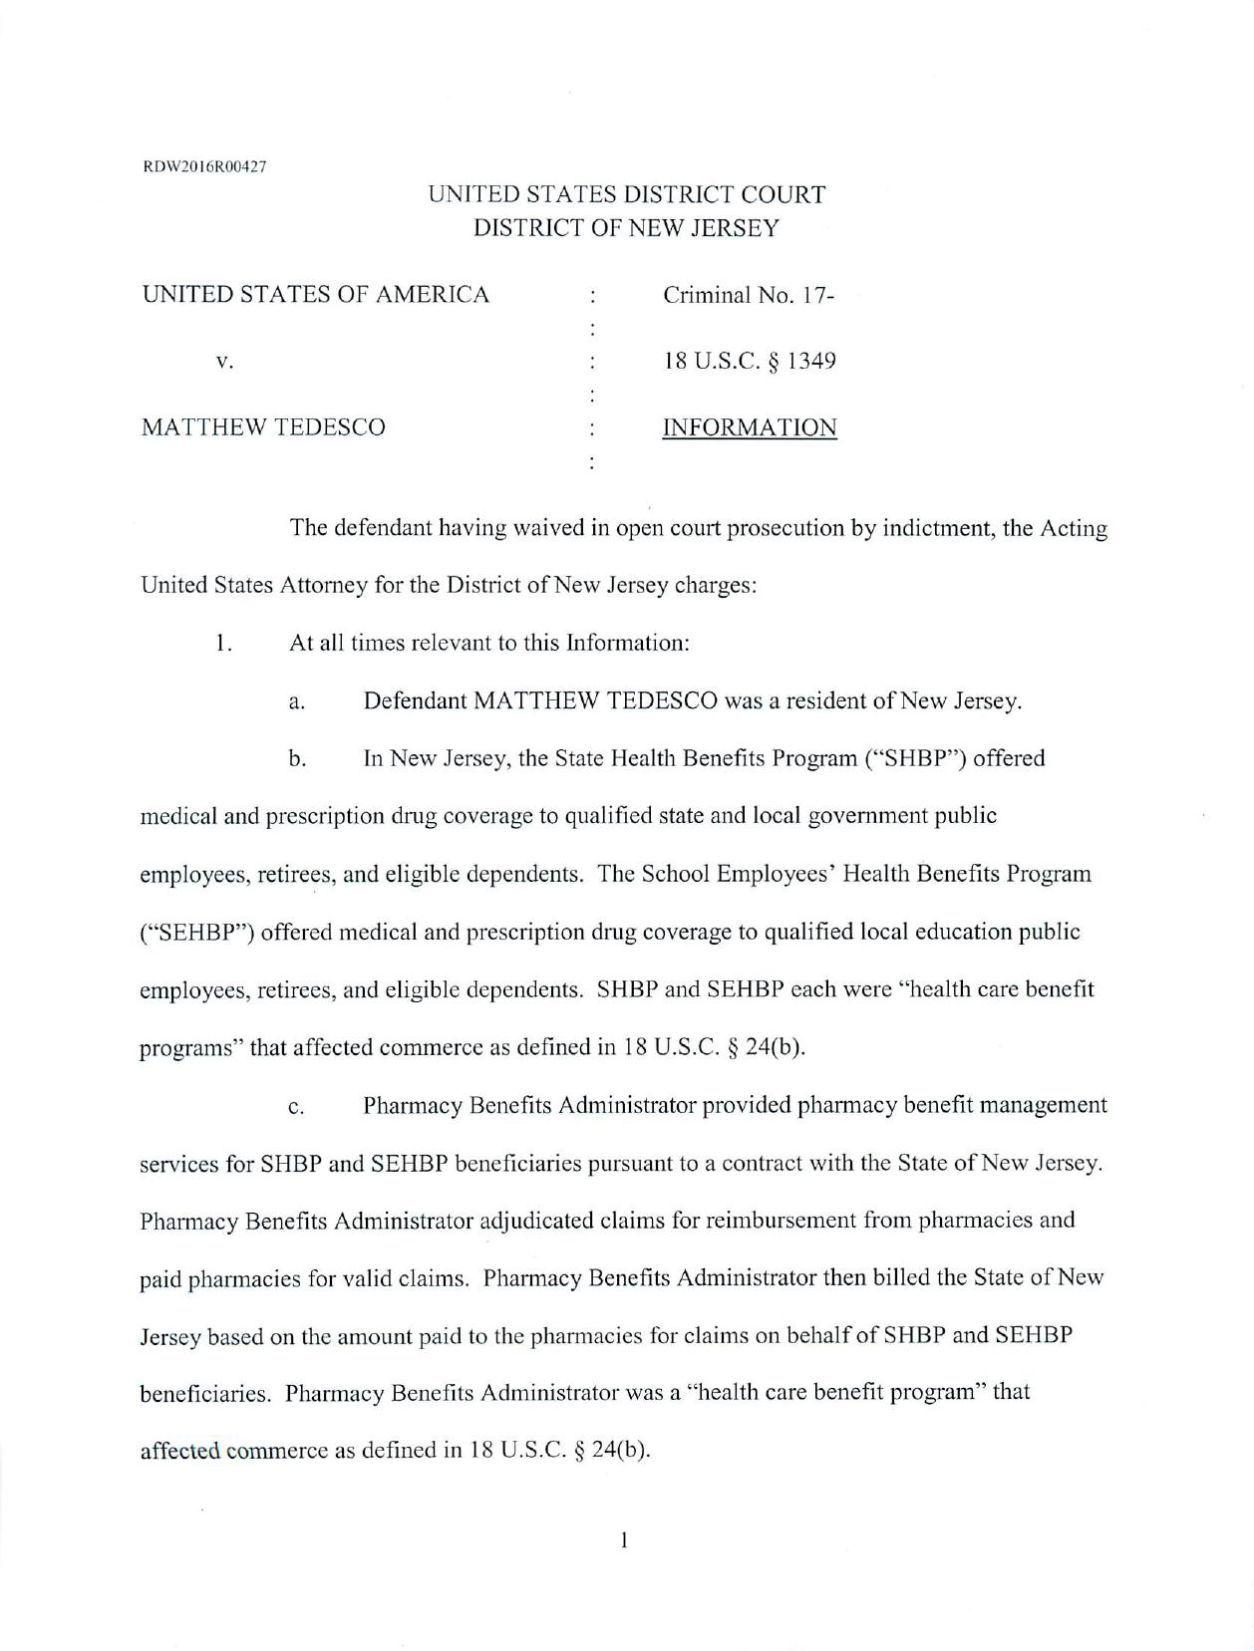 Healthcare Fraud Investigator Cover Letter benefits clerk cover ...